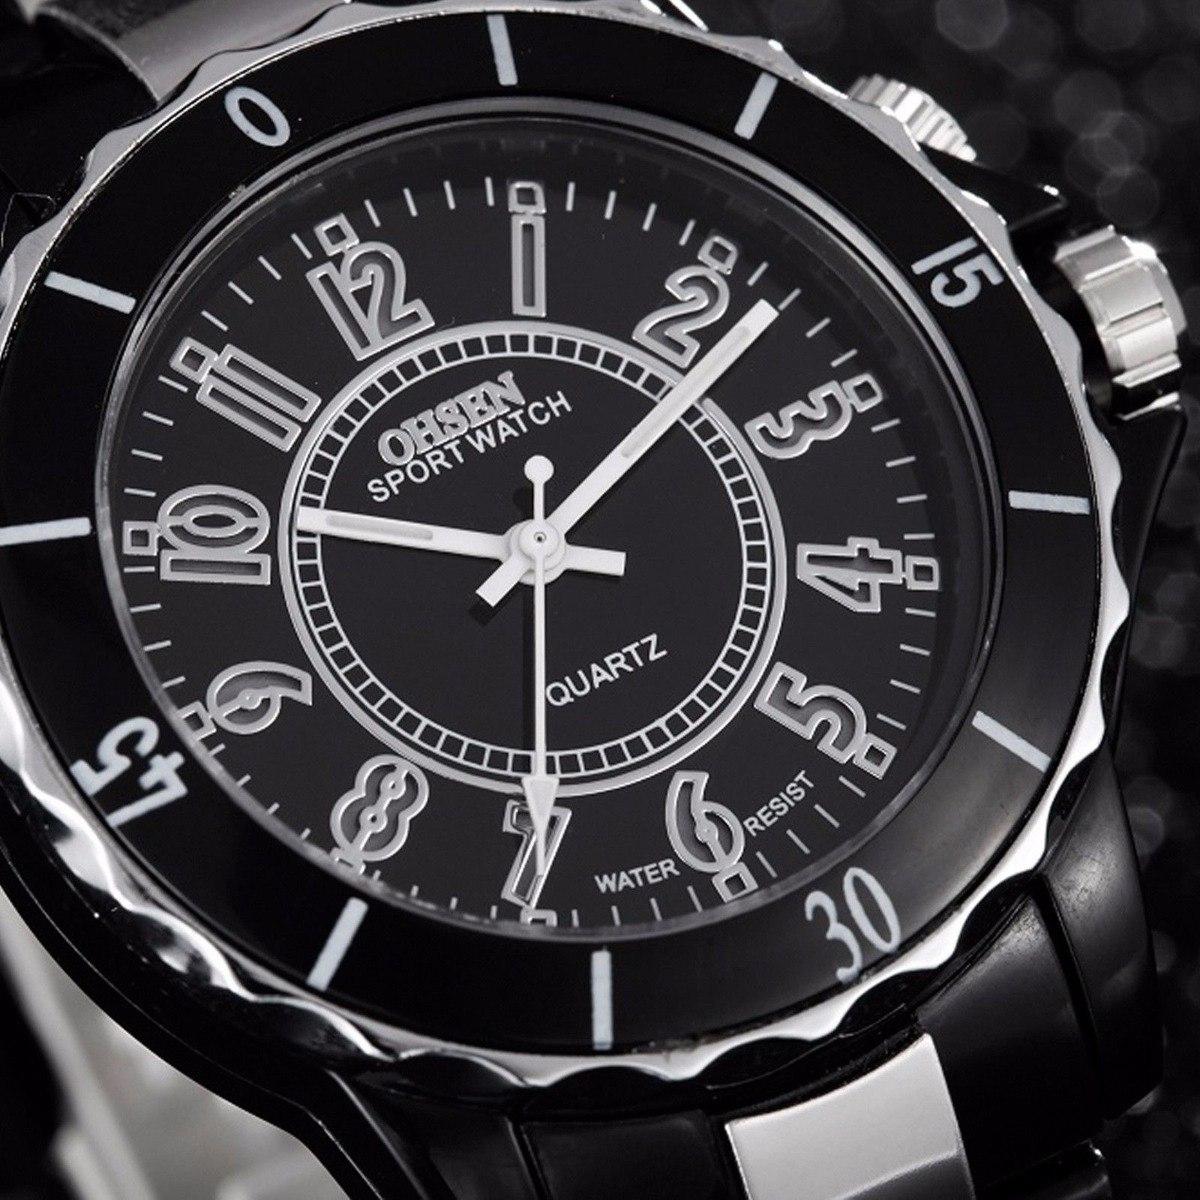 e0e1ffc6d39f Reloj Ohsen Metalico Sumergible Hasta 3 Metros